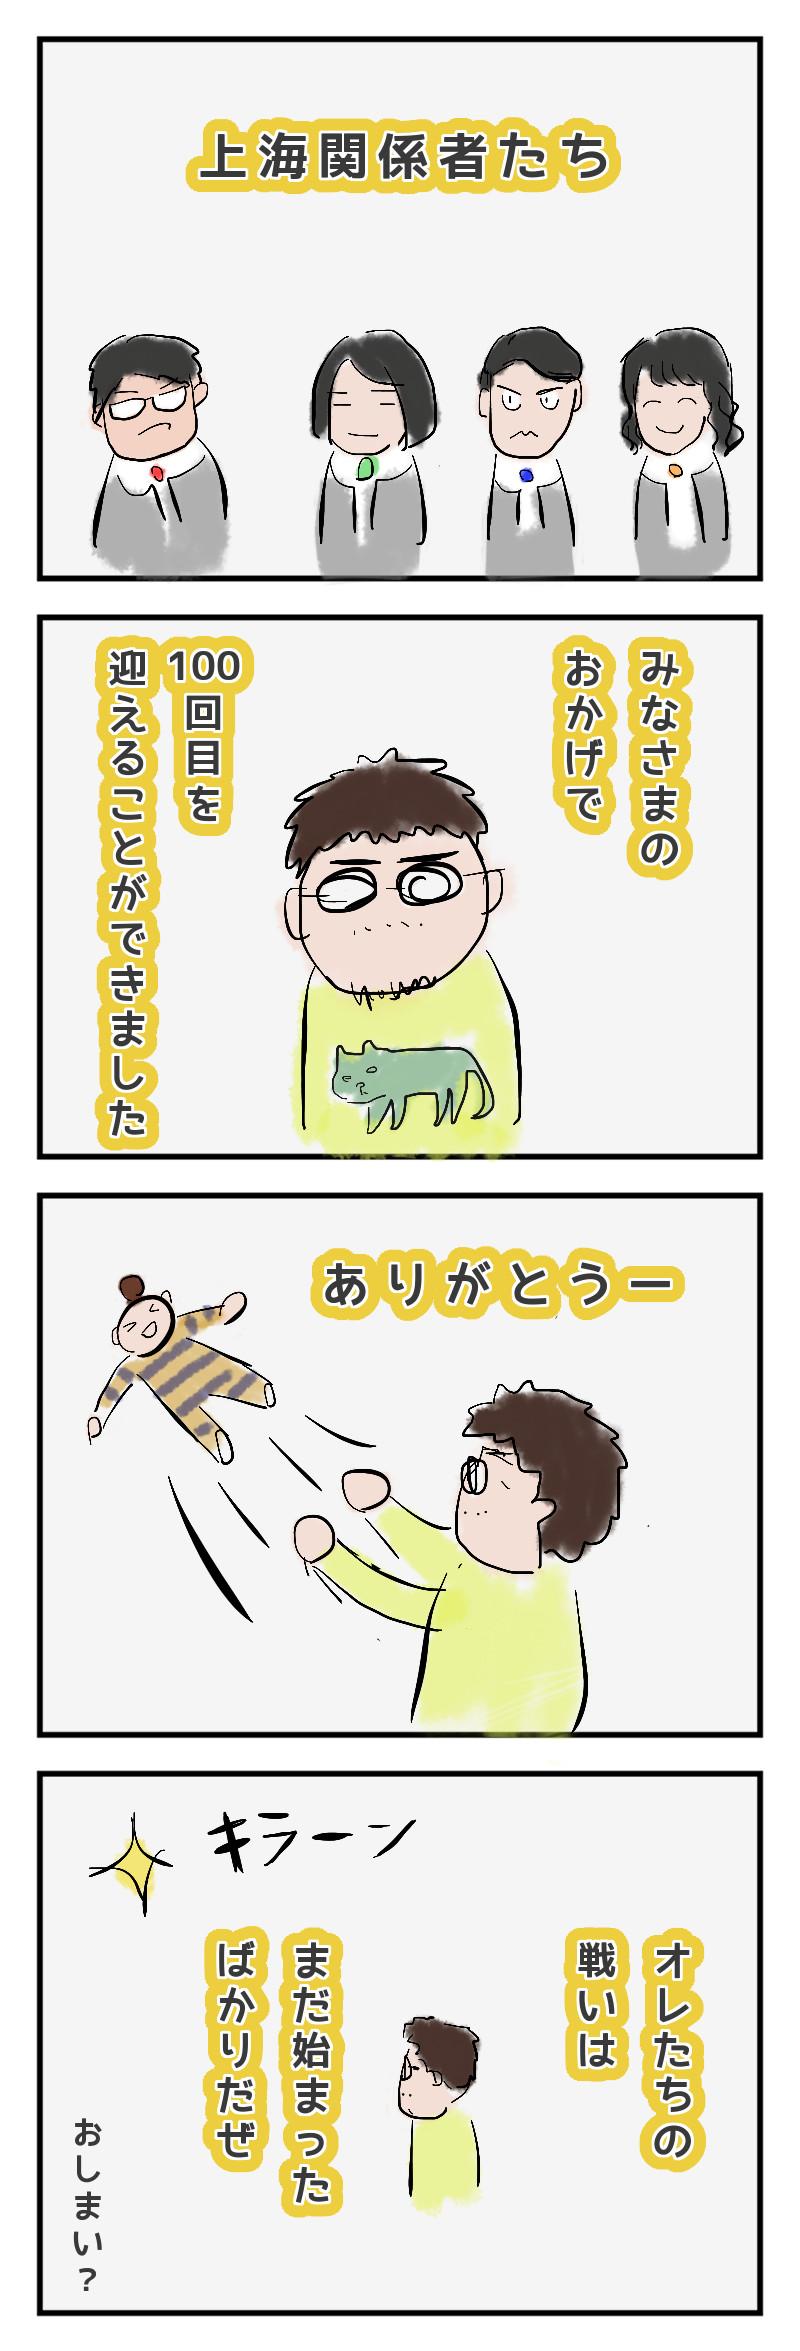 【100】-3